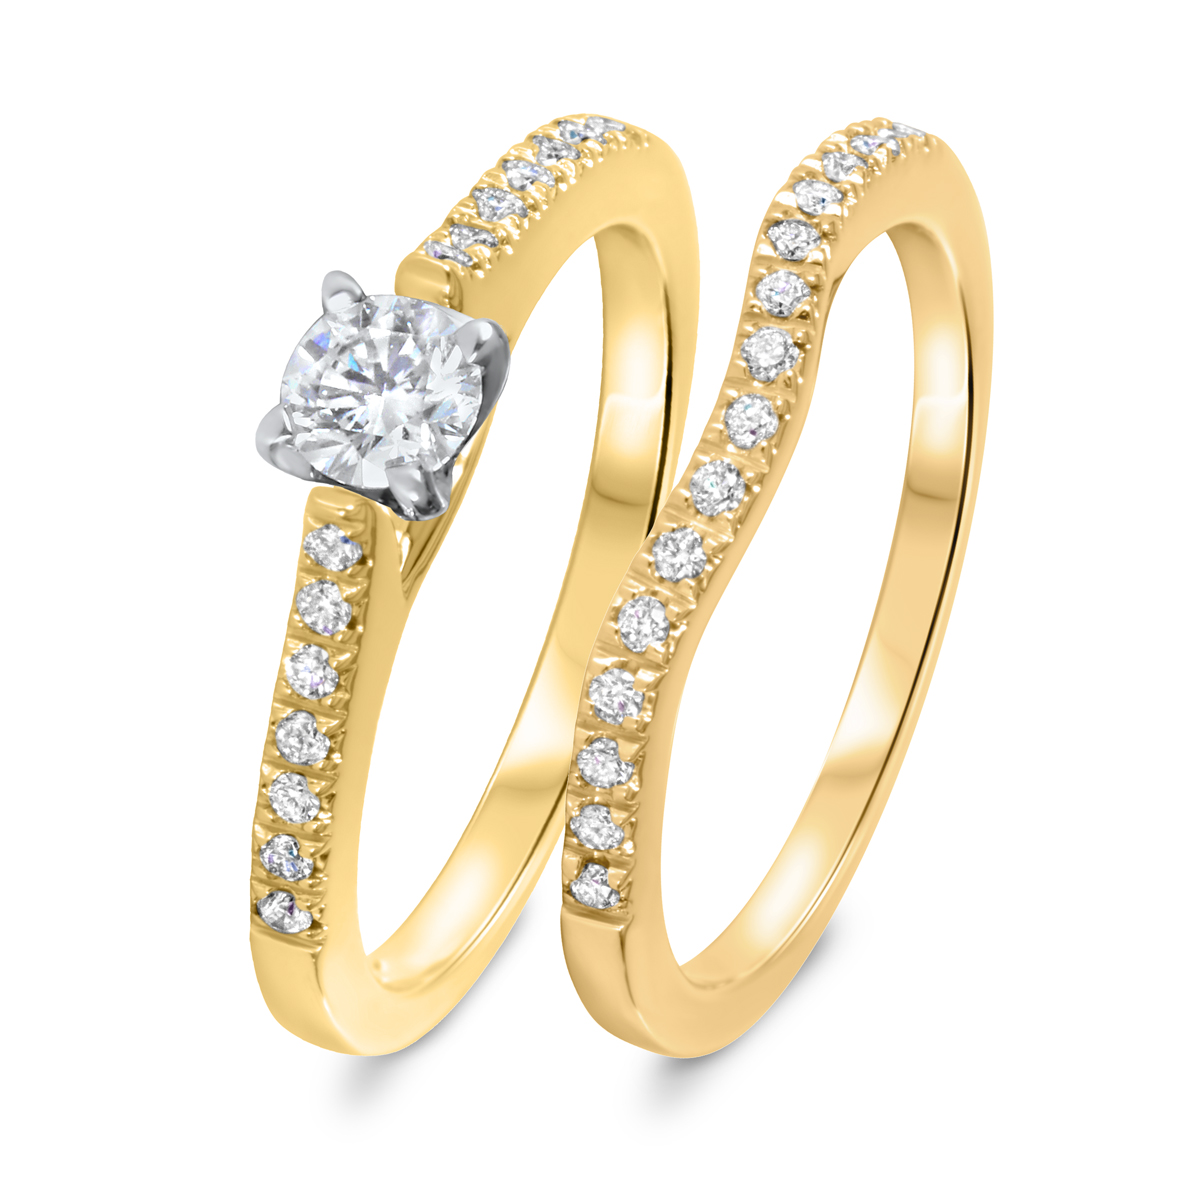 1/2 CT. T.W. Diamond Women's Bridal Wedding Ring Set 10K Yellow Gold